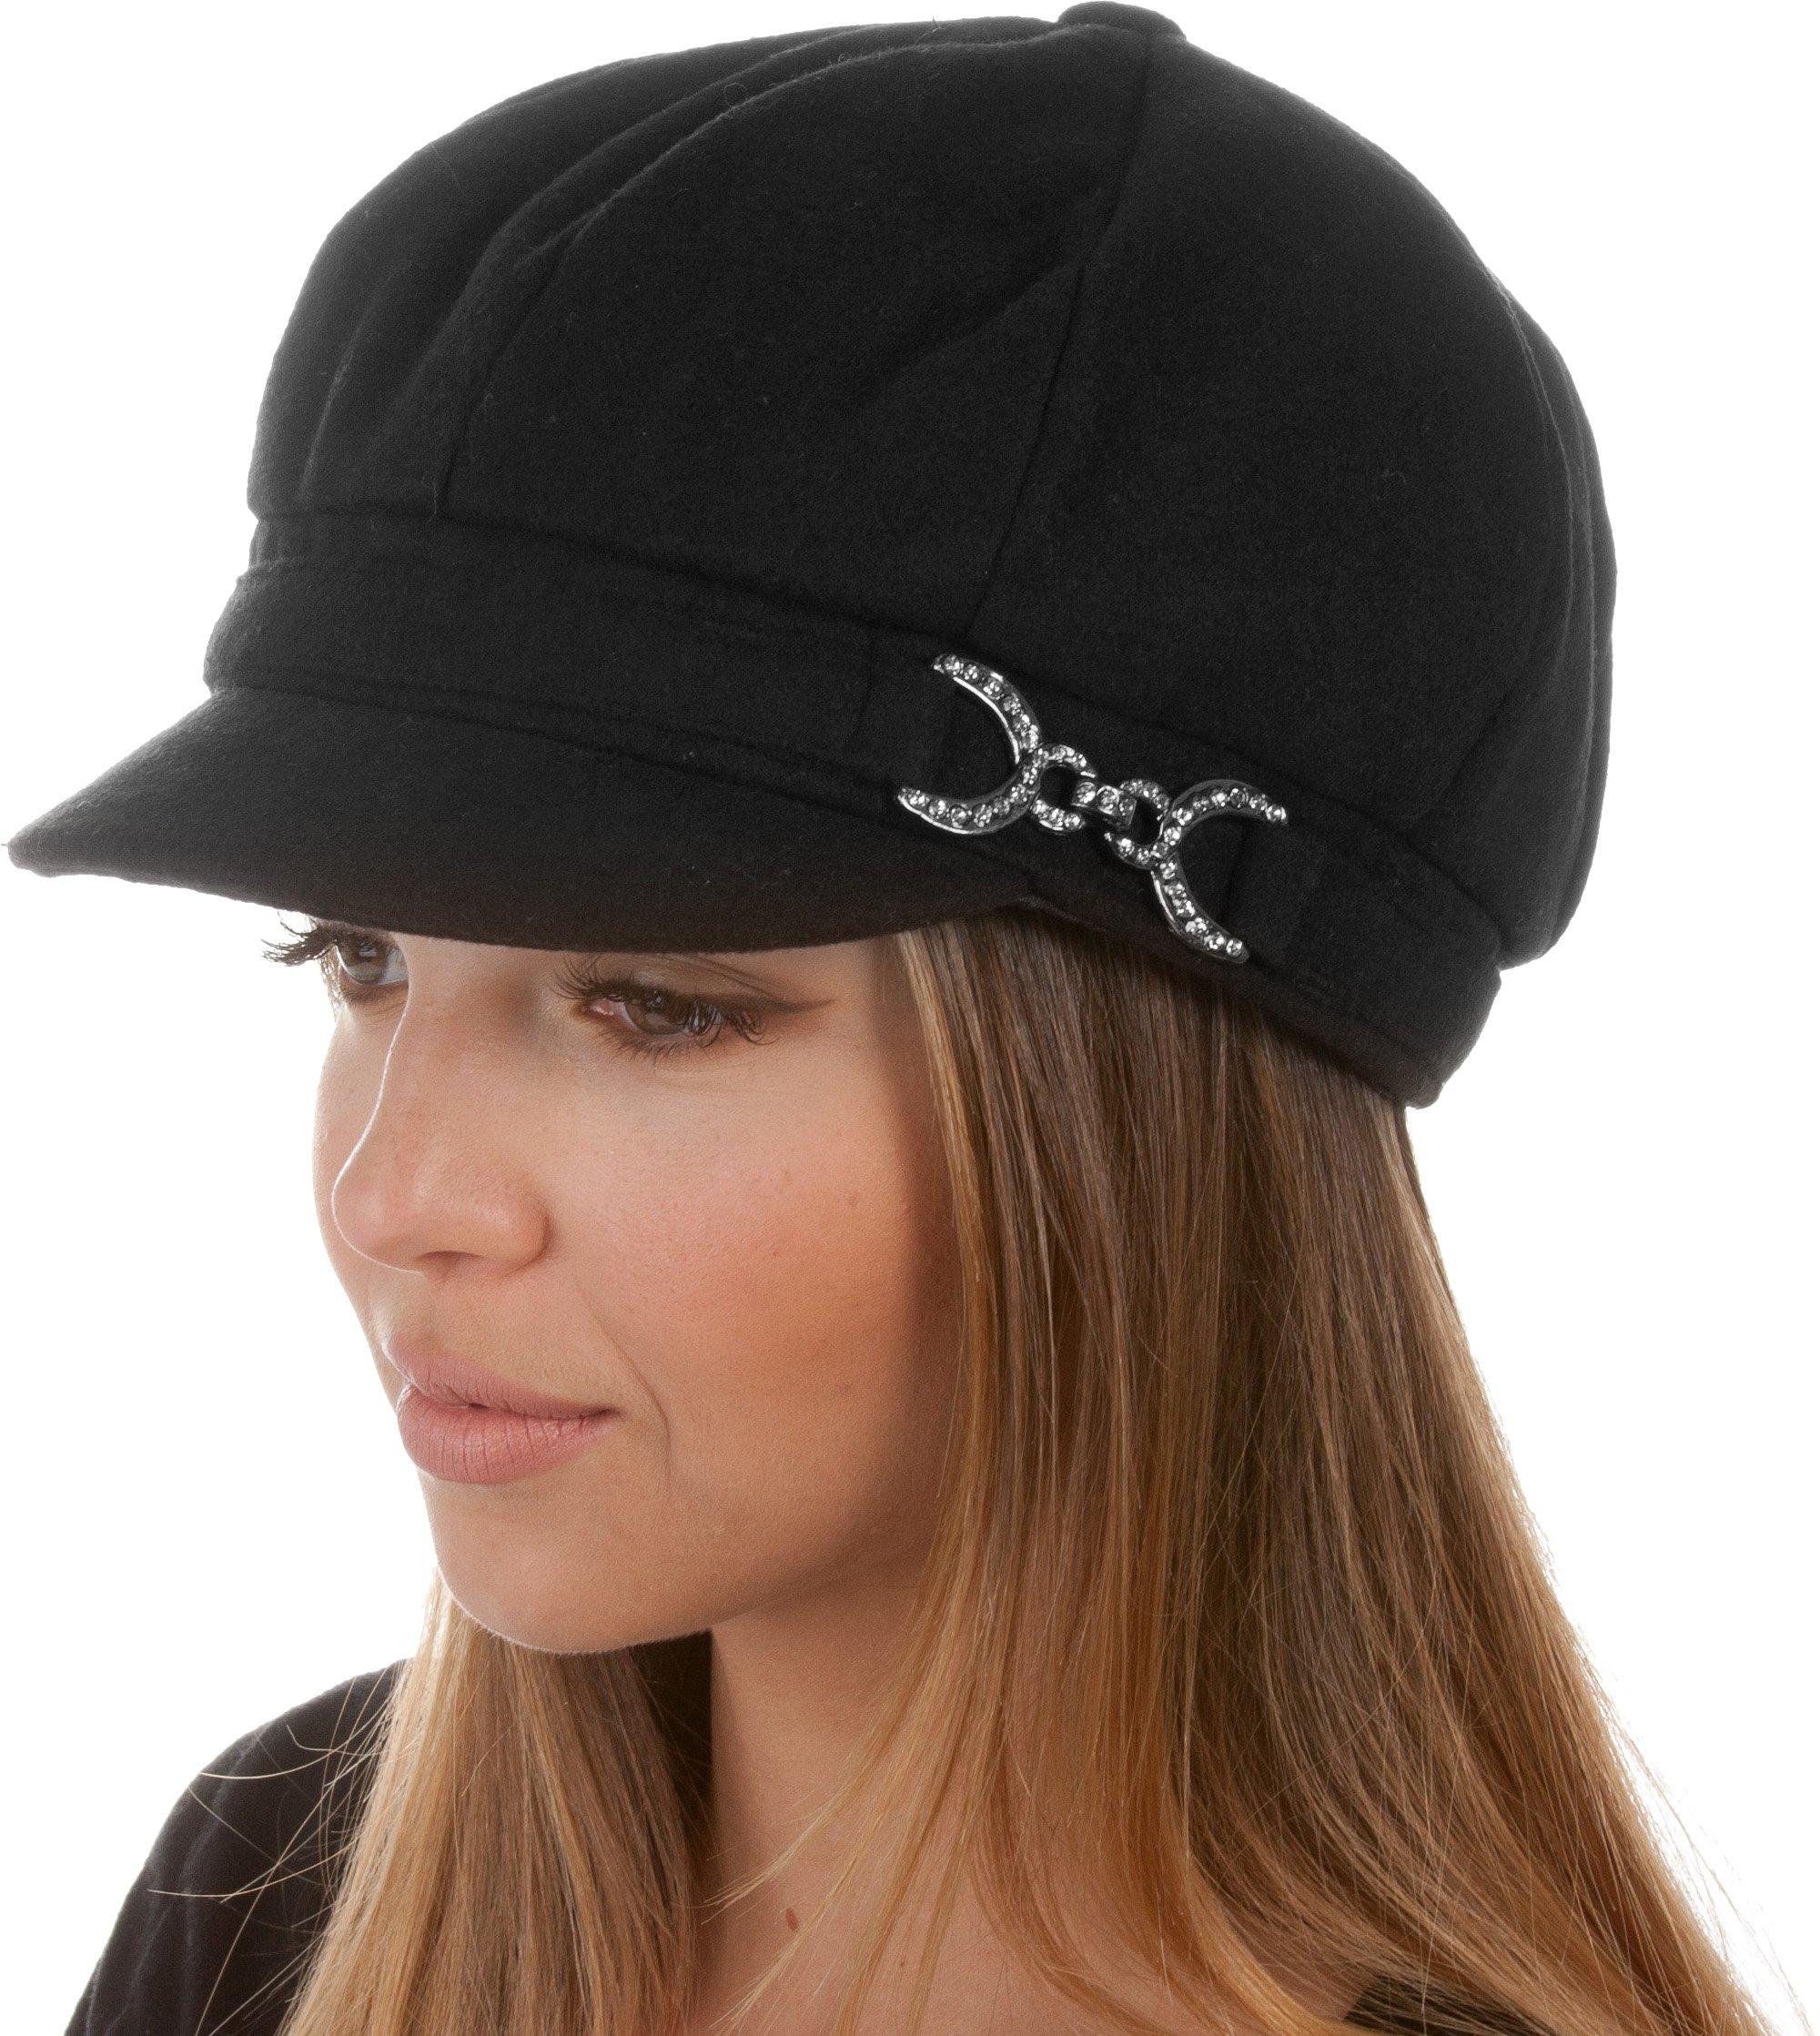 Sakkas 305BC Jessica Wool Newsboy Cabbie Hat with Rhinestone Buckle - Black - One Size